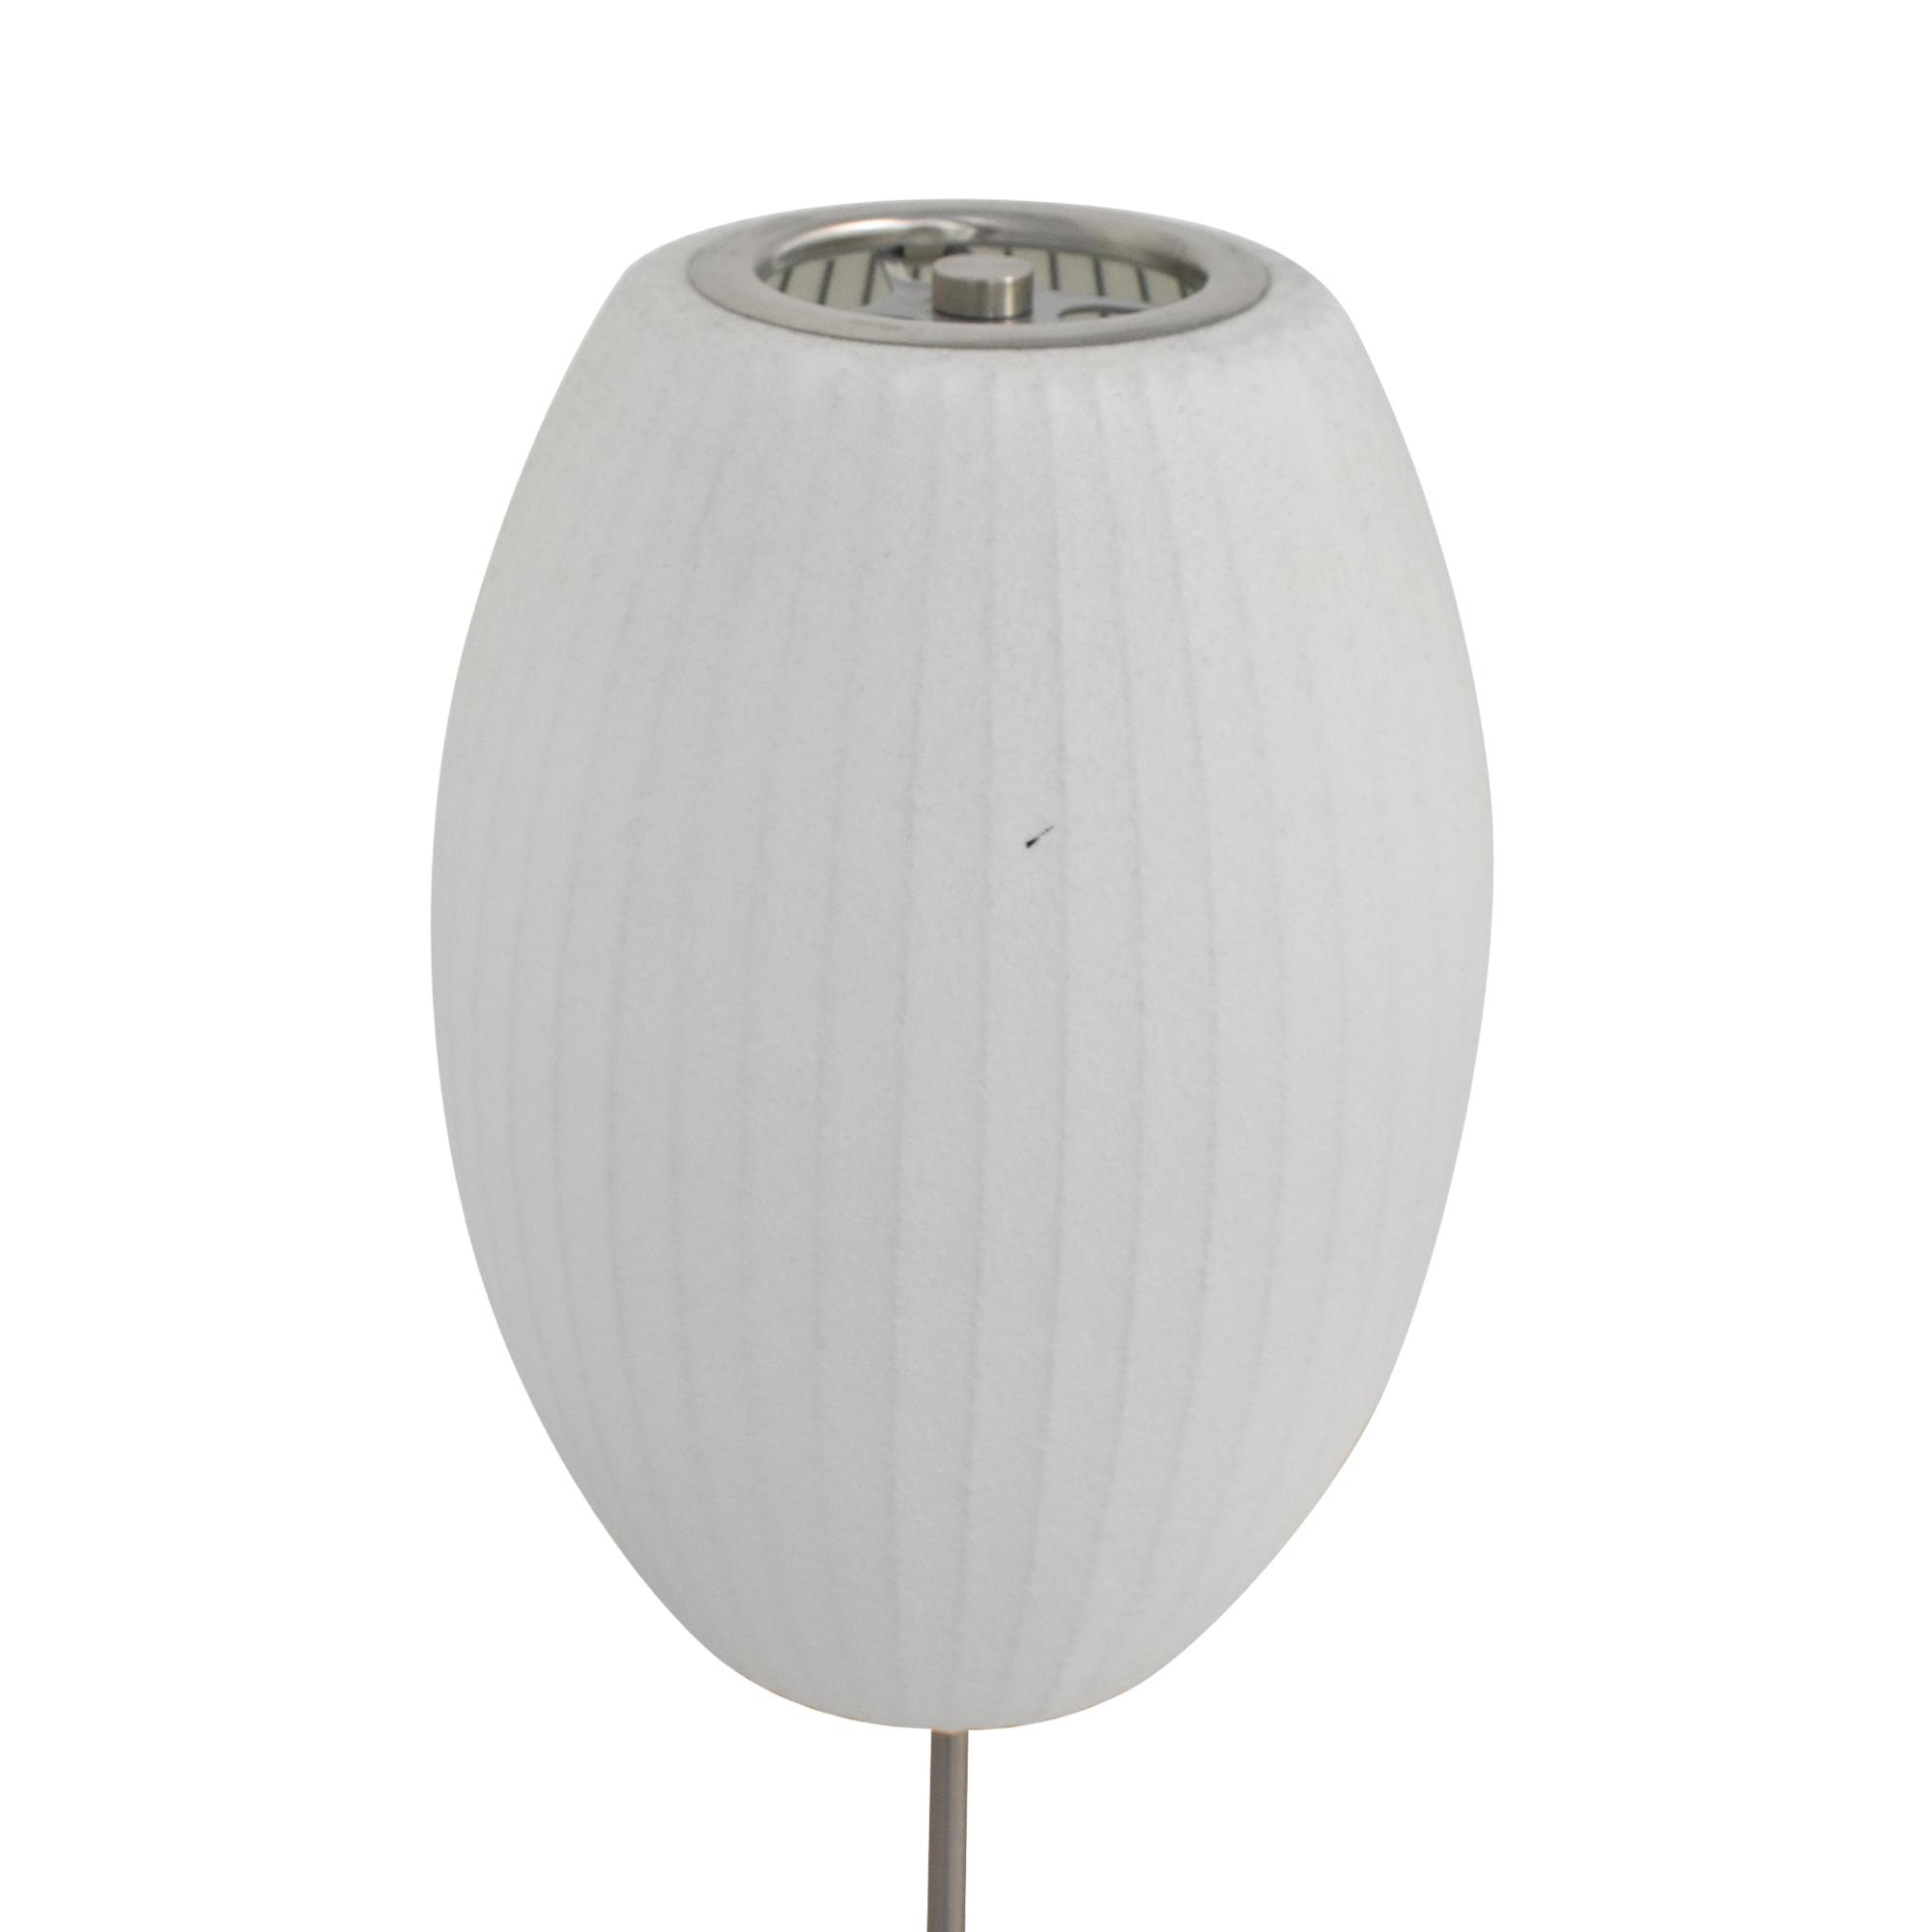 buy Modernica Modernica Nelson Bubble Lamps Cigar Lotus Table Lamp online